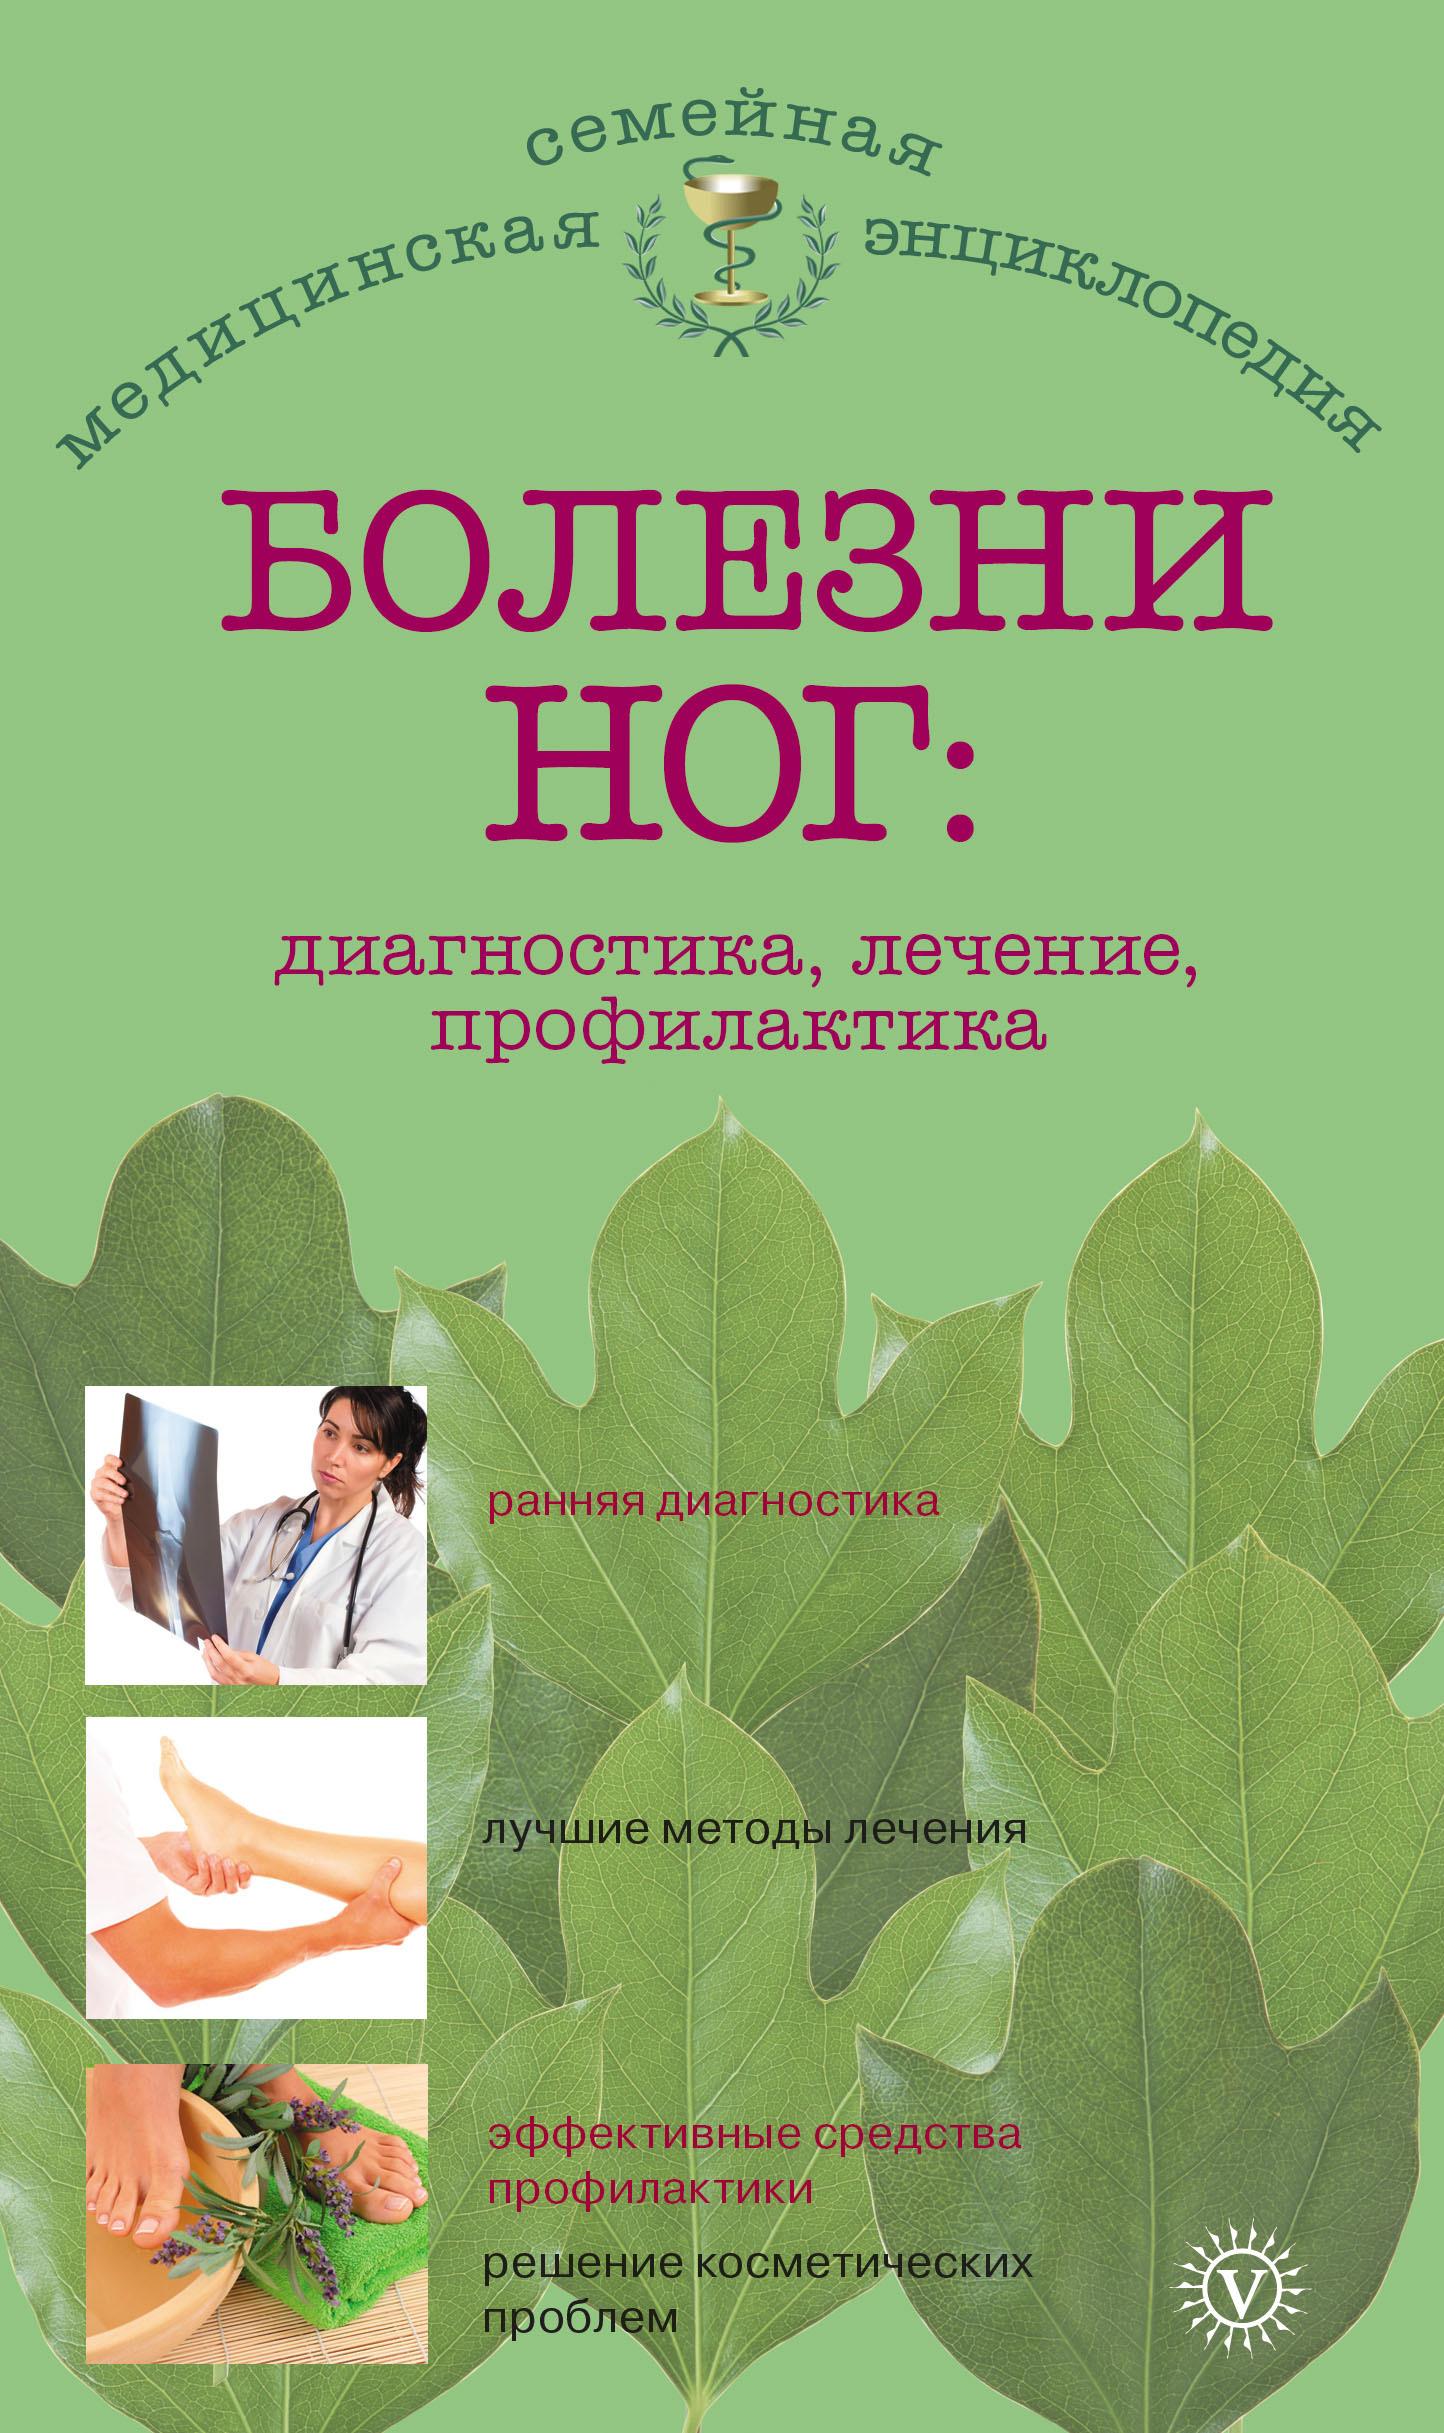 Е. М. Савельева Болезни ног: диагностика, лечение, профилактика е м савельева болезни ног диагностика лечение профилактика